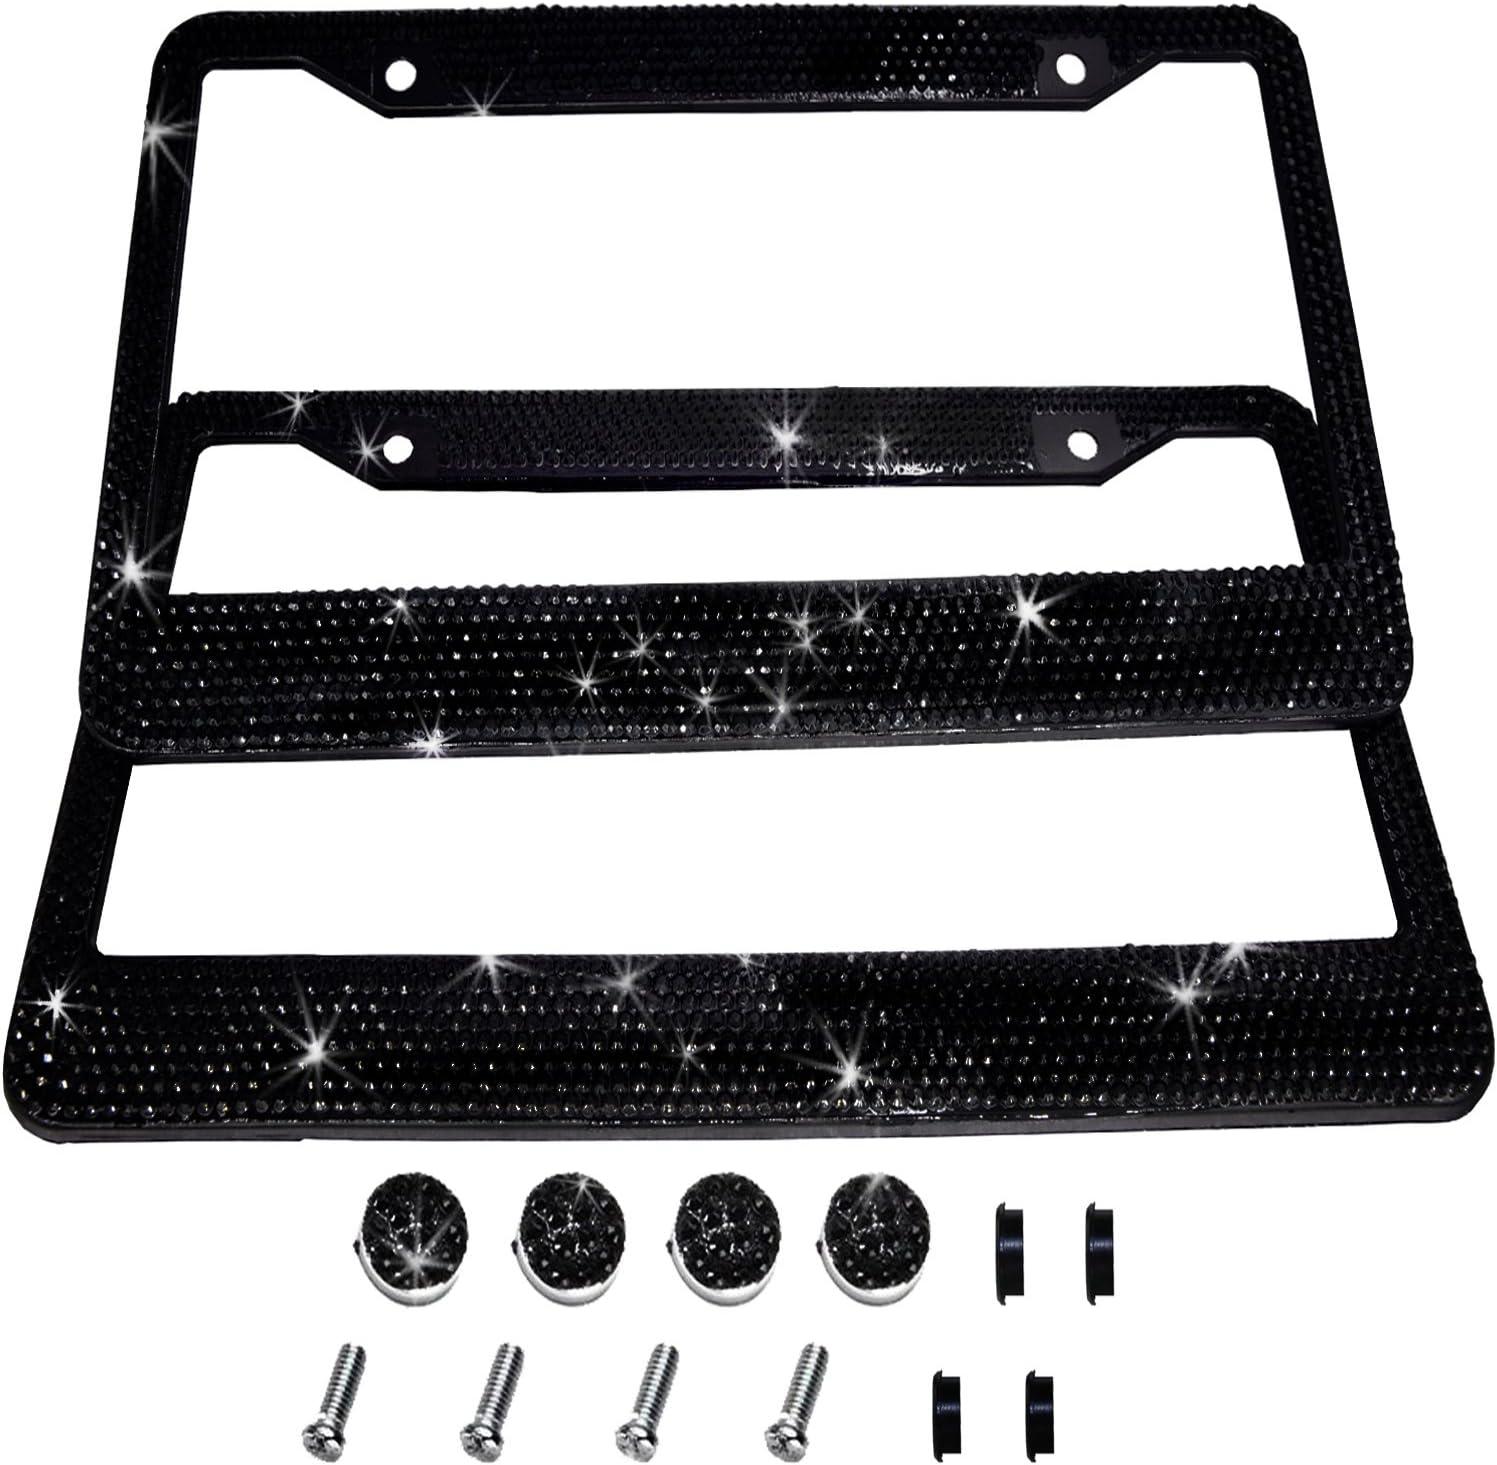 SAVORI License Plate Frame Screws Bolts Crystal Rhinestone Anti-Theft Metal Fastener Caps Cover Kit Universal Bling Car Accessories Decor 2PCS AB Color